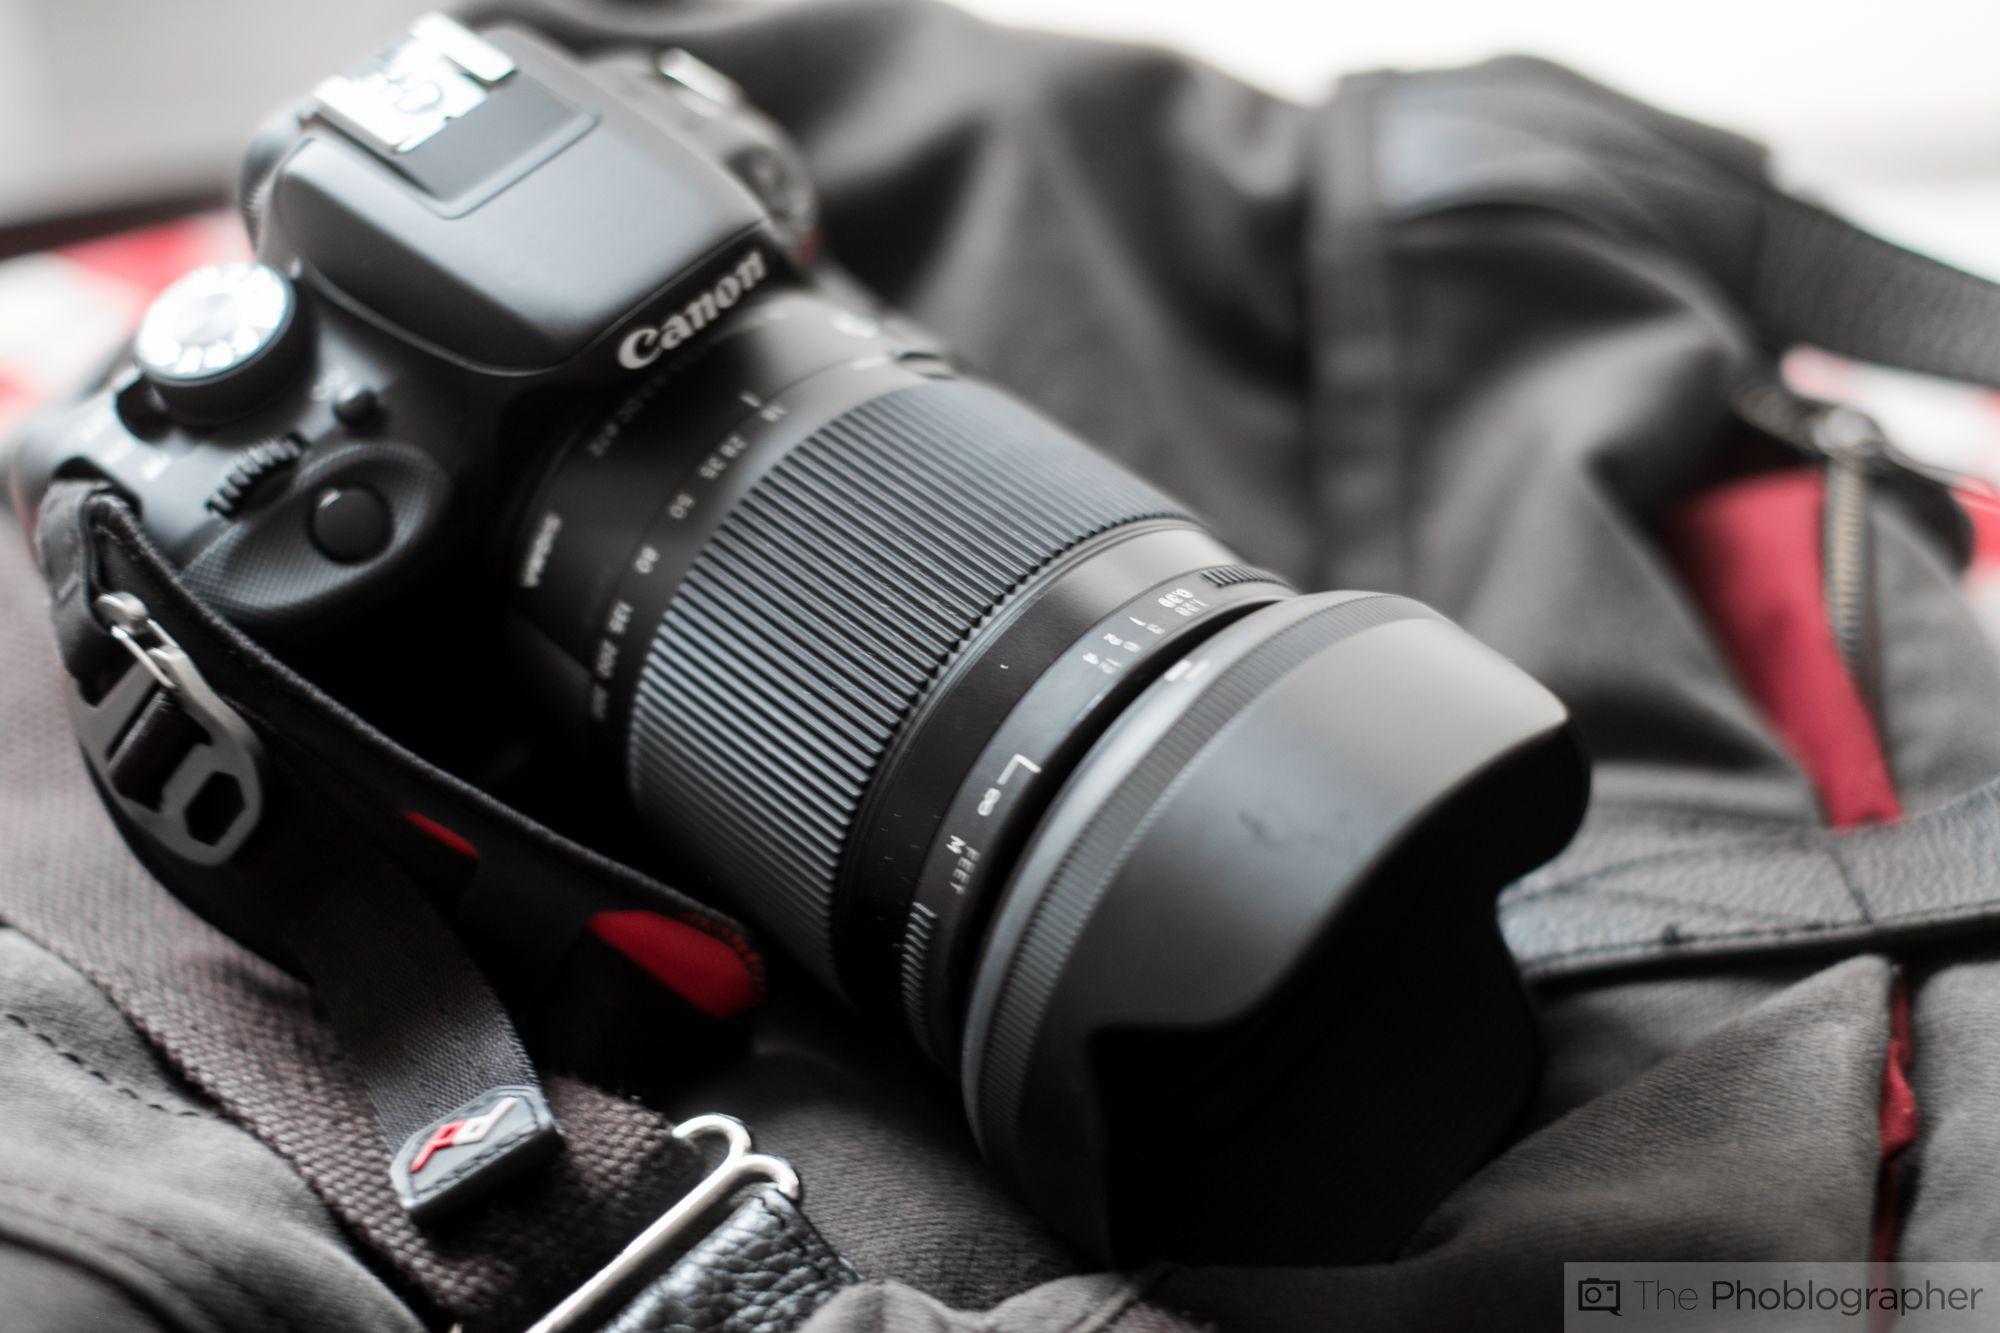 Review Sigma 18 300mm F 3 5 6 3 Dc Macro Os Hsm Contemporary Lens Canon Ef Canon Lens Sigma Lenses Sigma